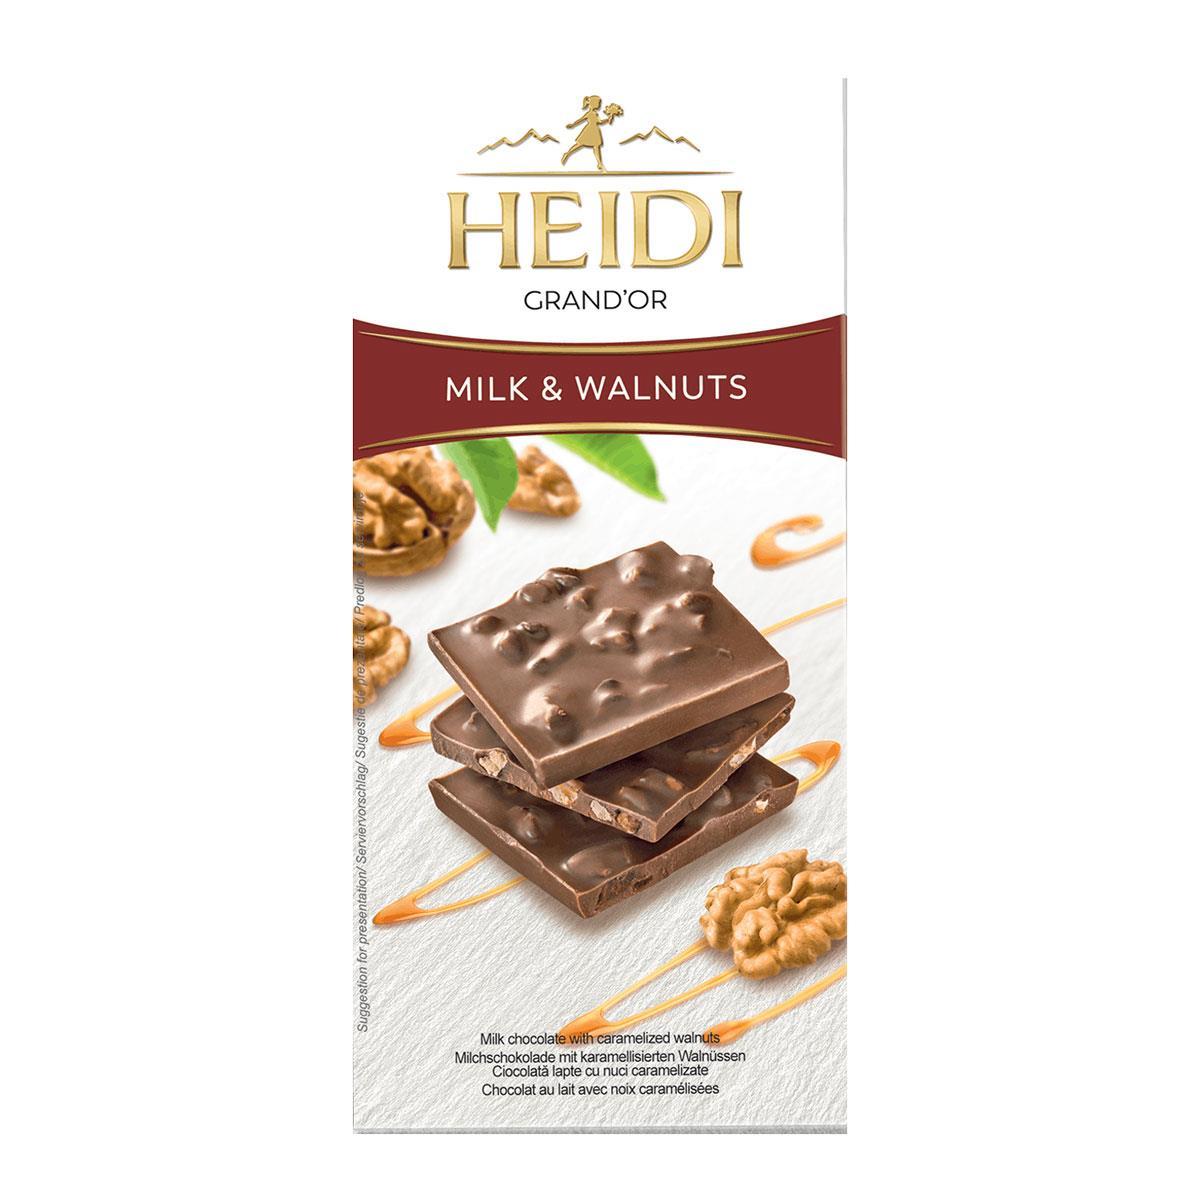 Heidi GrandOr Milk & Walnuts 90gr.